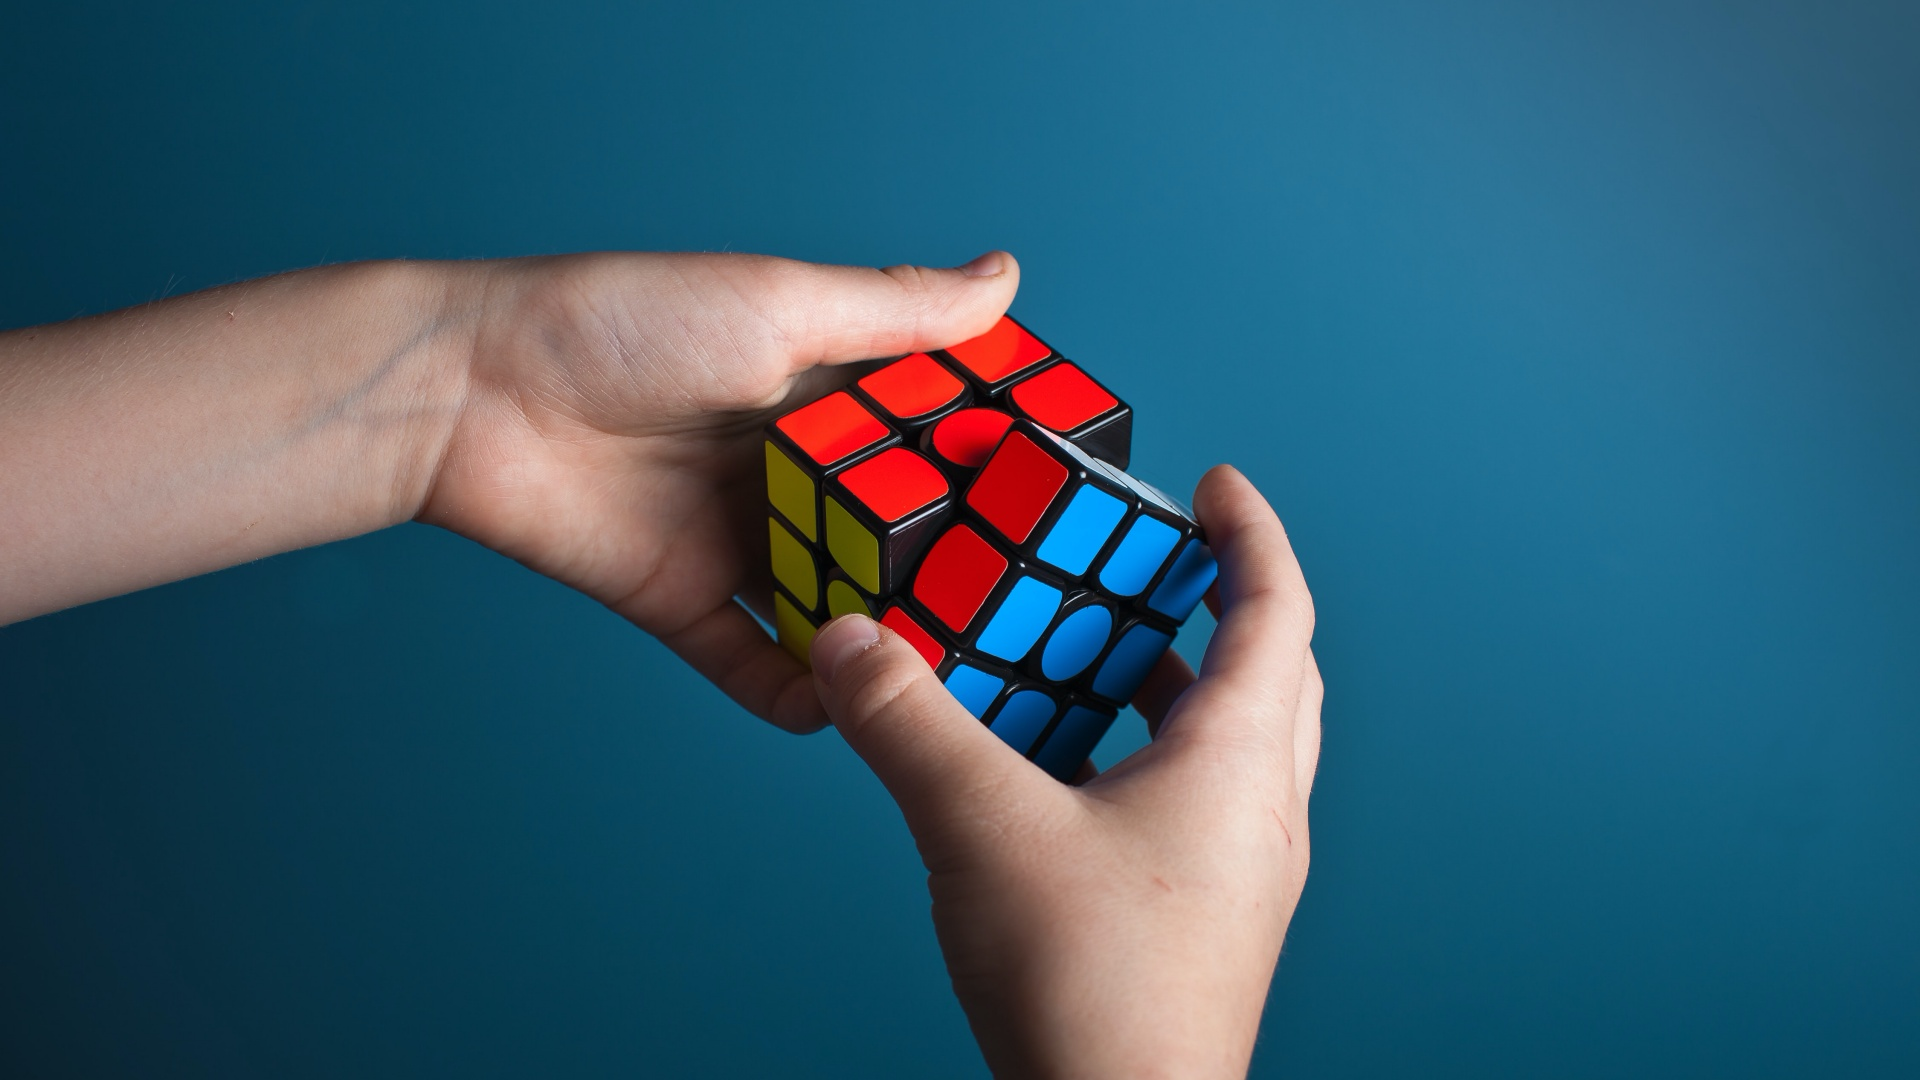 rubik-cube-olav-ahrens-rotne-unsplash-1920x1080